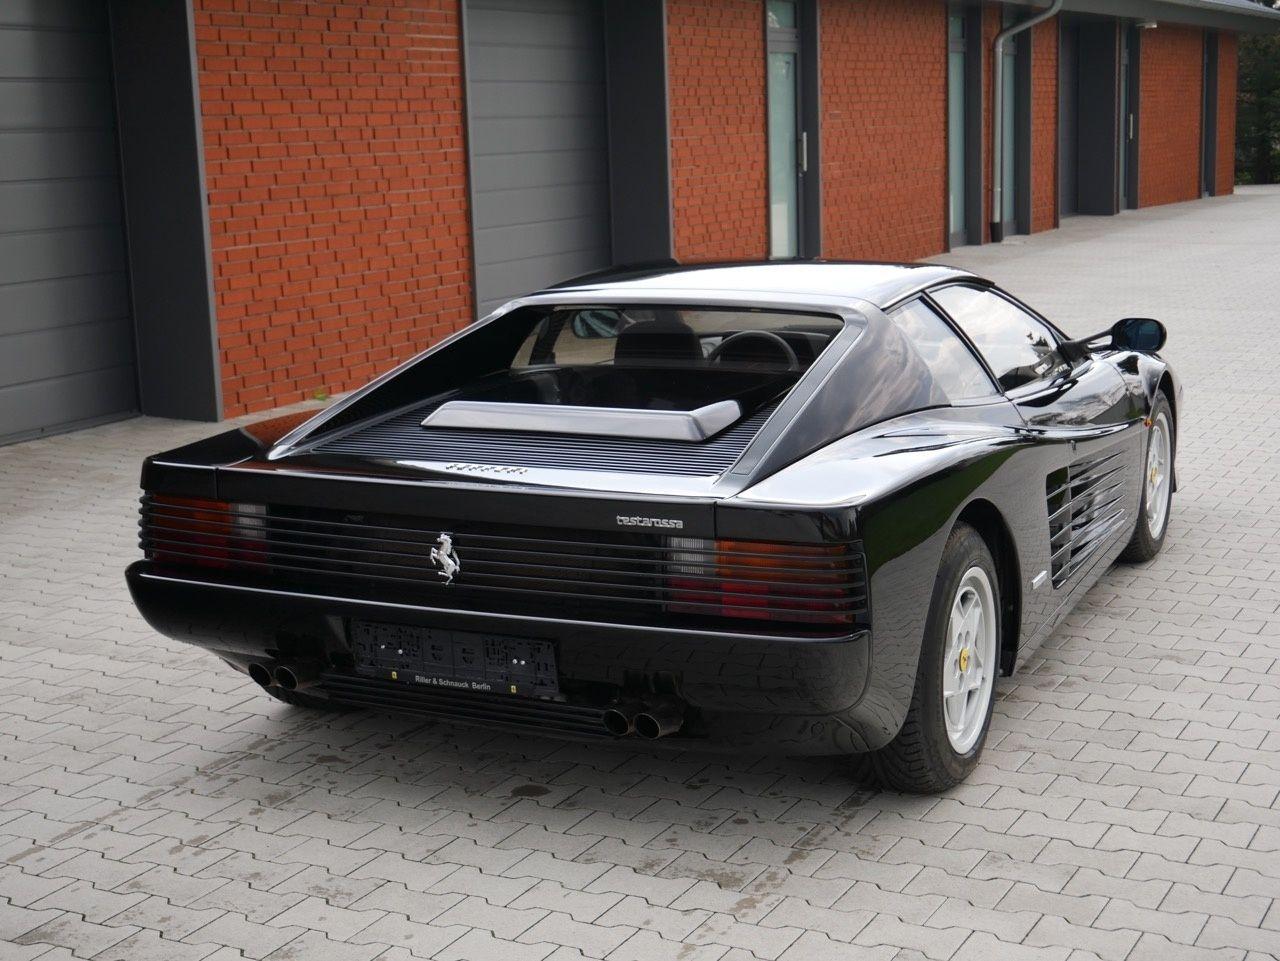 1991 Ferrari Testarossa , black/black , only 300km since